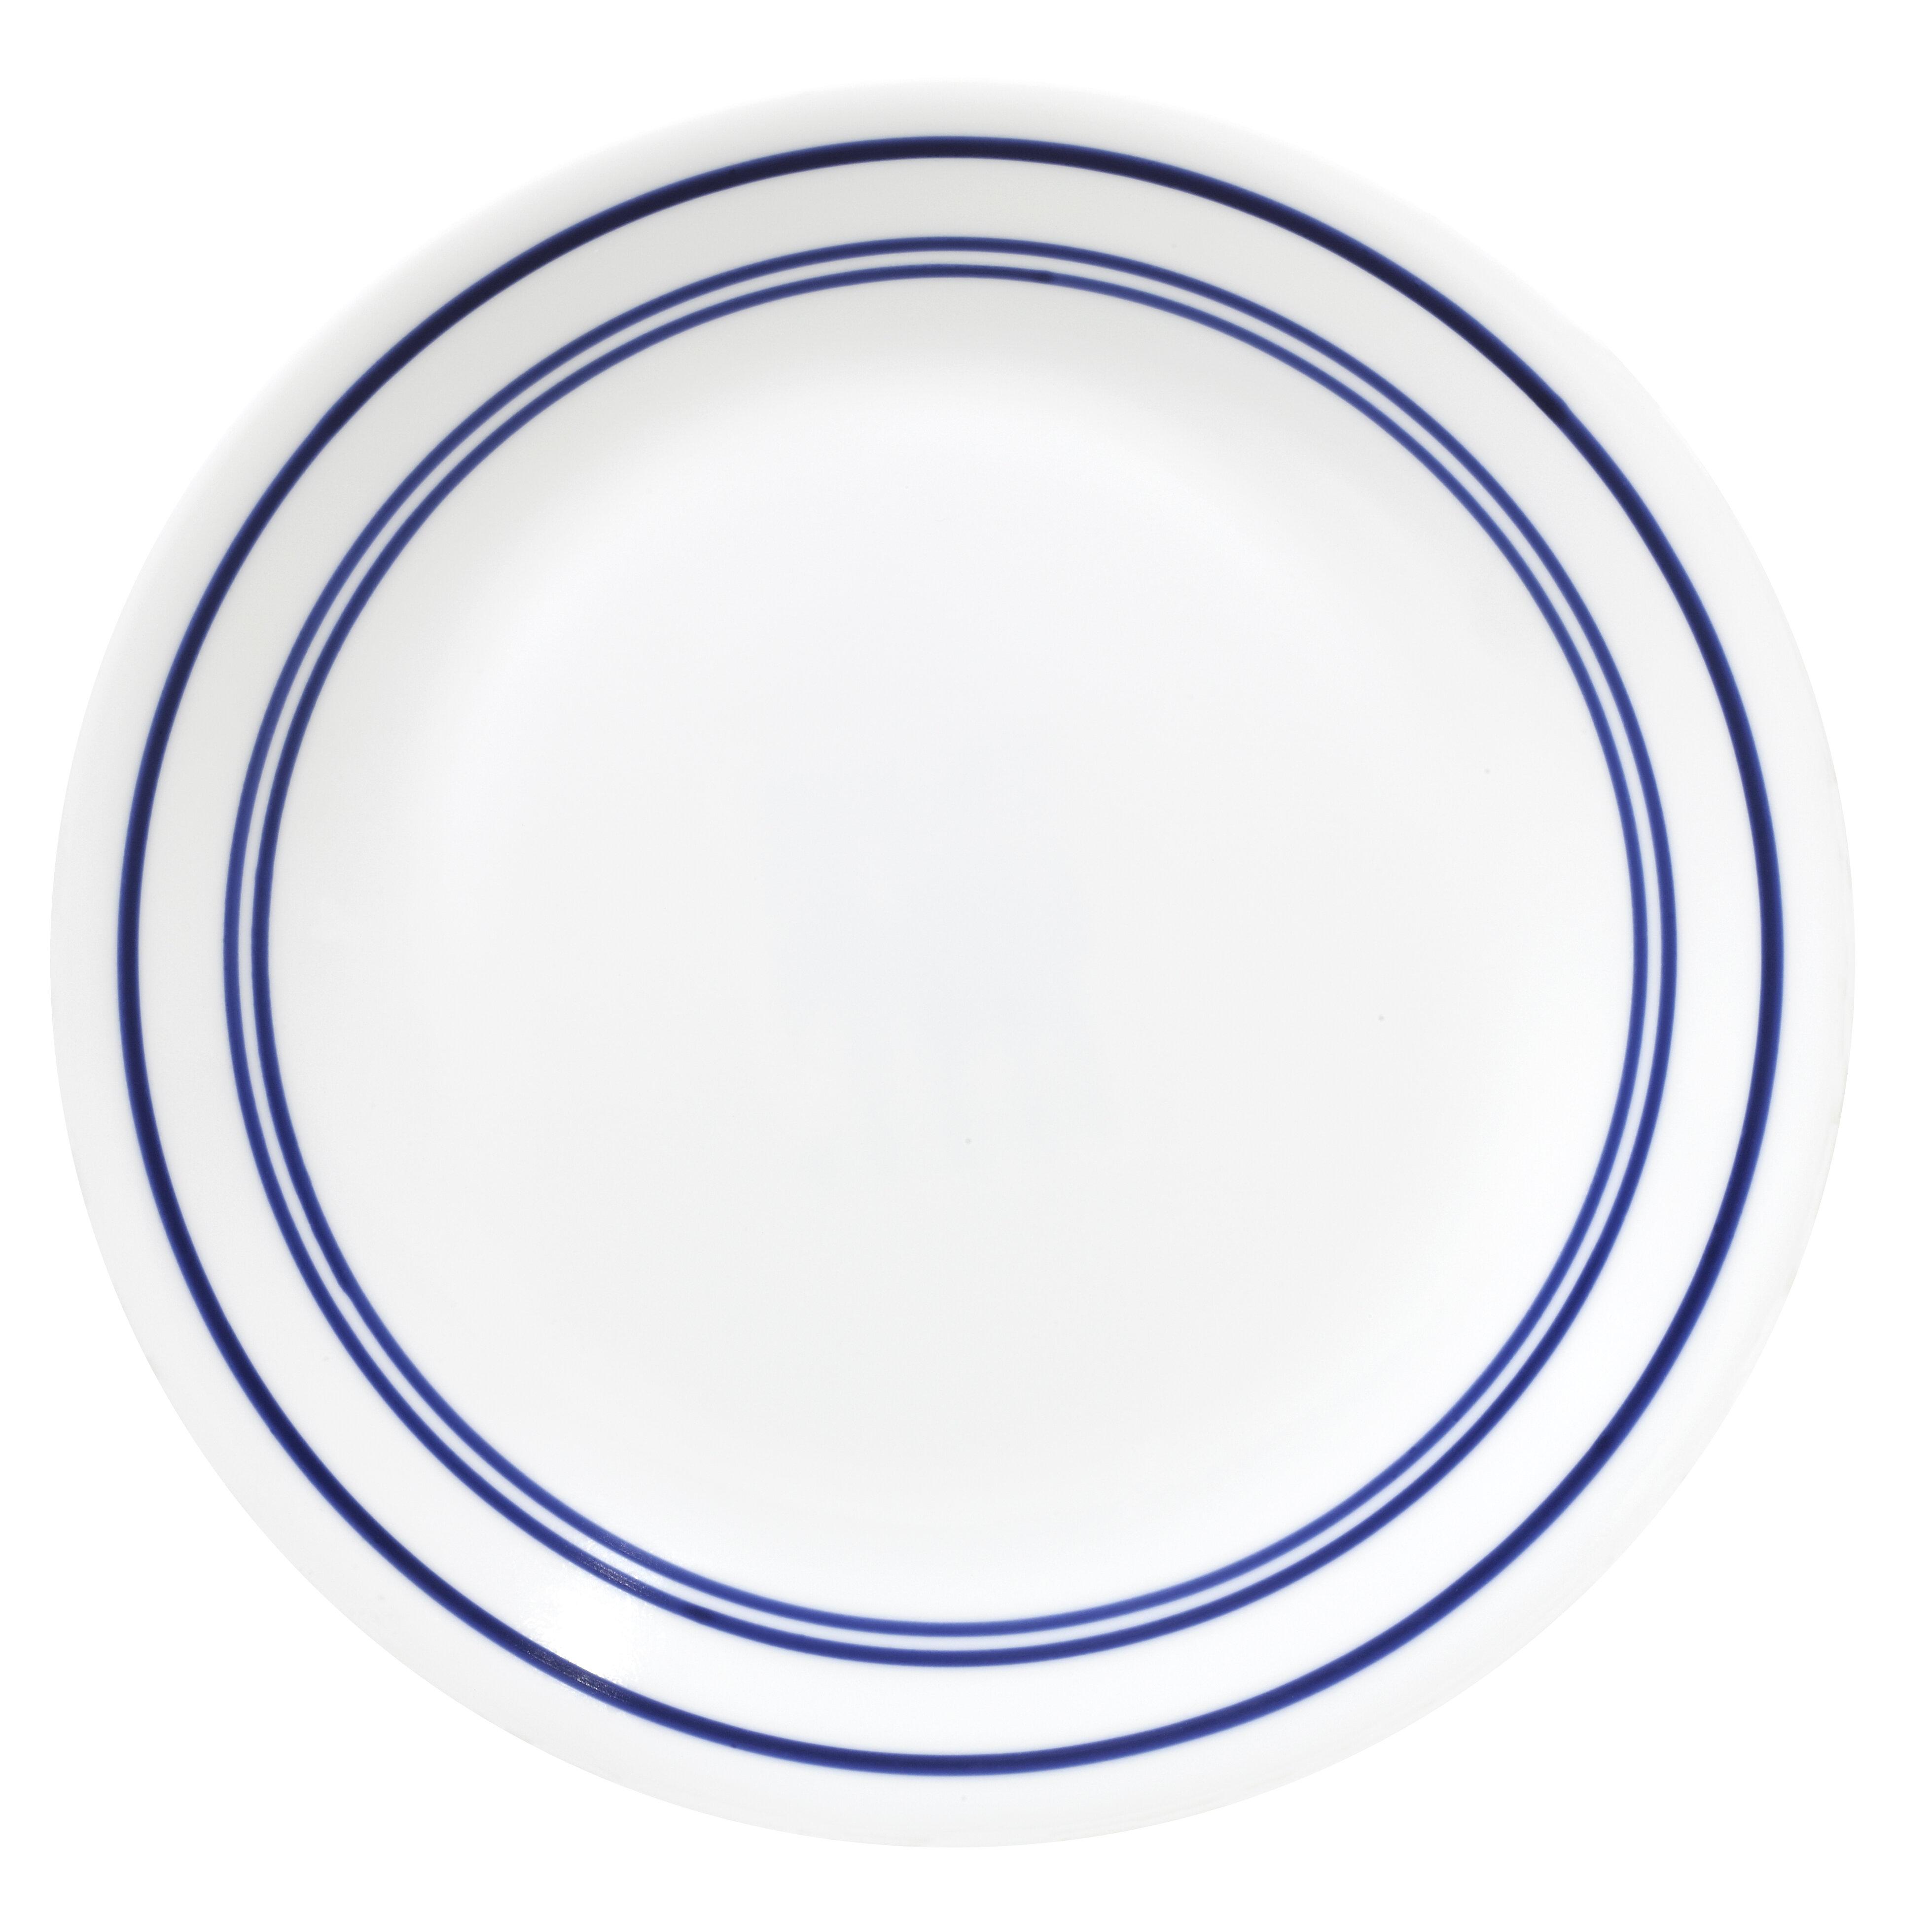 Salad Or Dessert Corelle Plates Saucers From 30 Until 11 20 Wayfair Wayfair